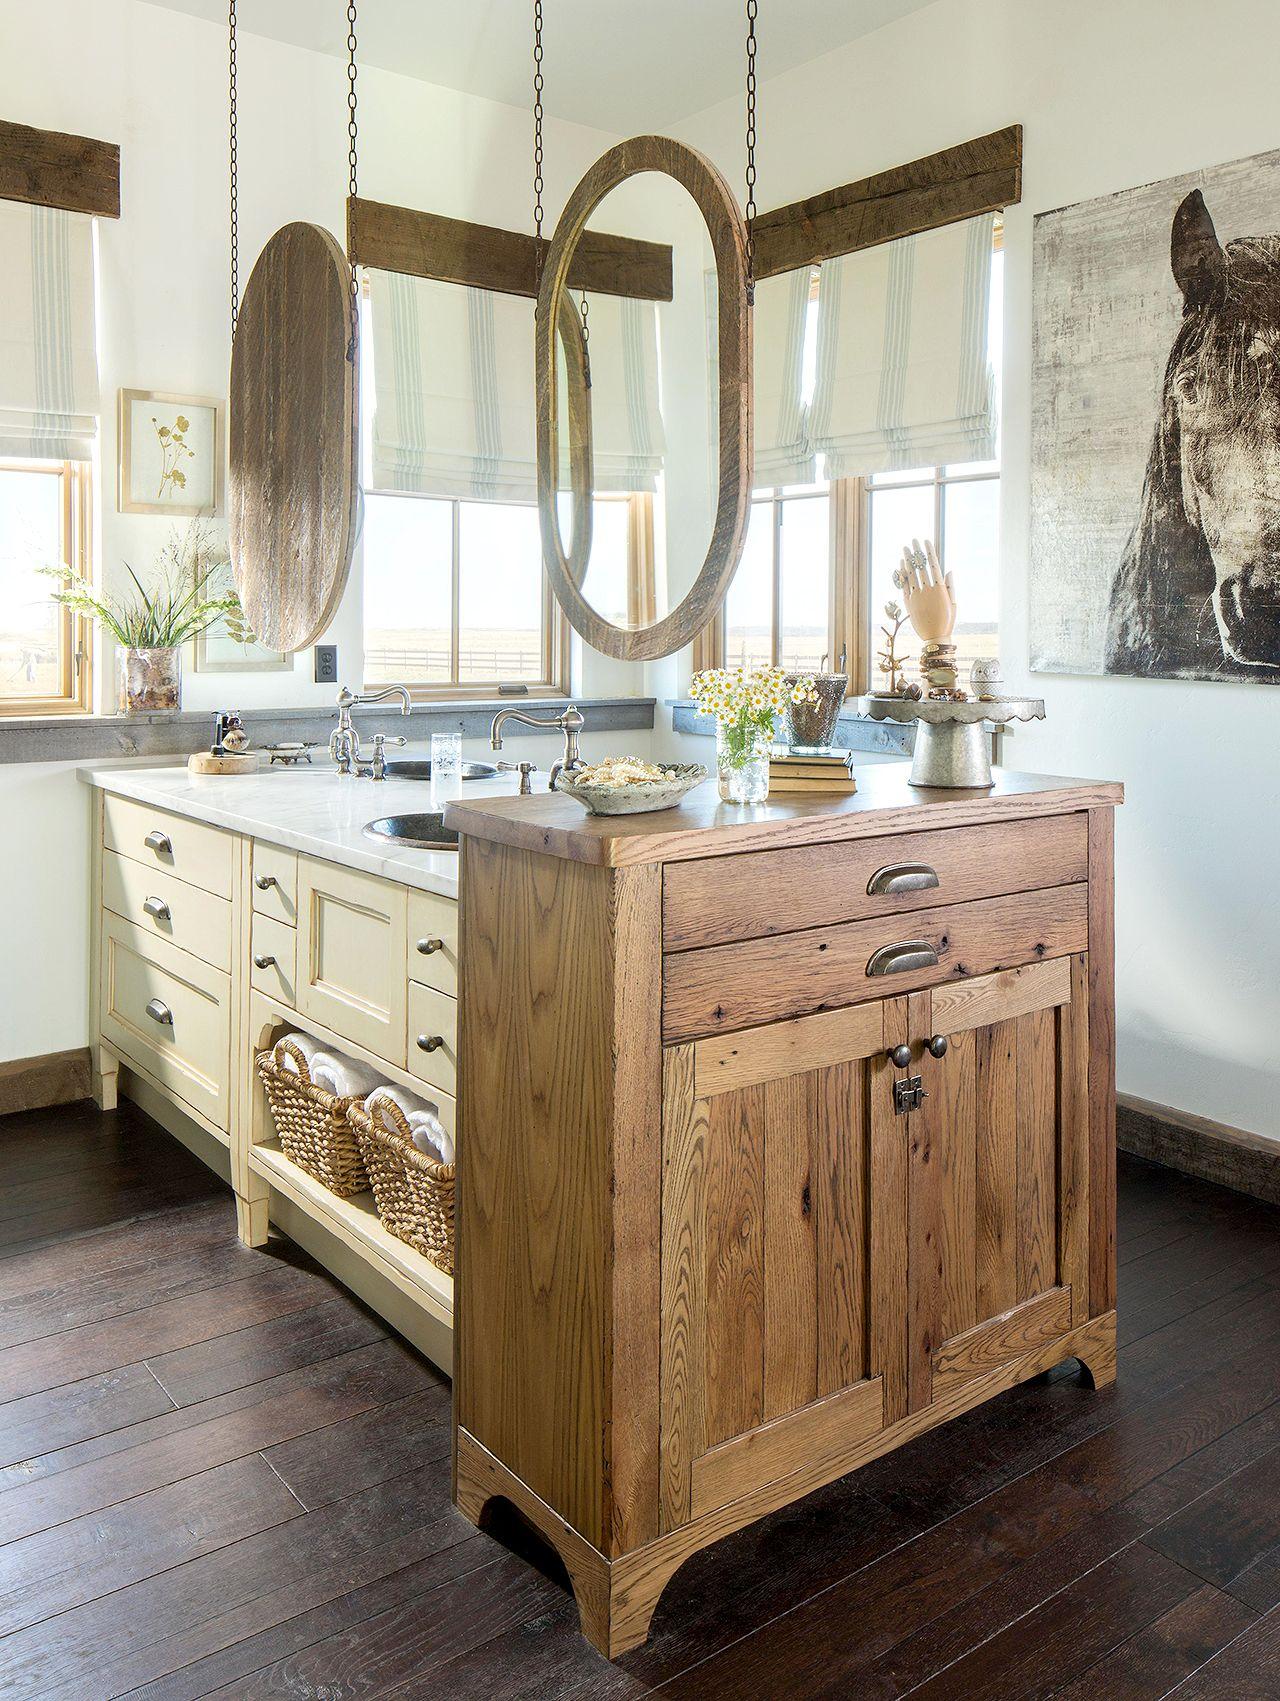 Marvelous Our Favorite Bathroom Upgrades Bathroom Bathroom Download Free Architecture Designs Embacsunscenecom